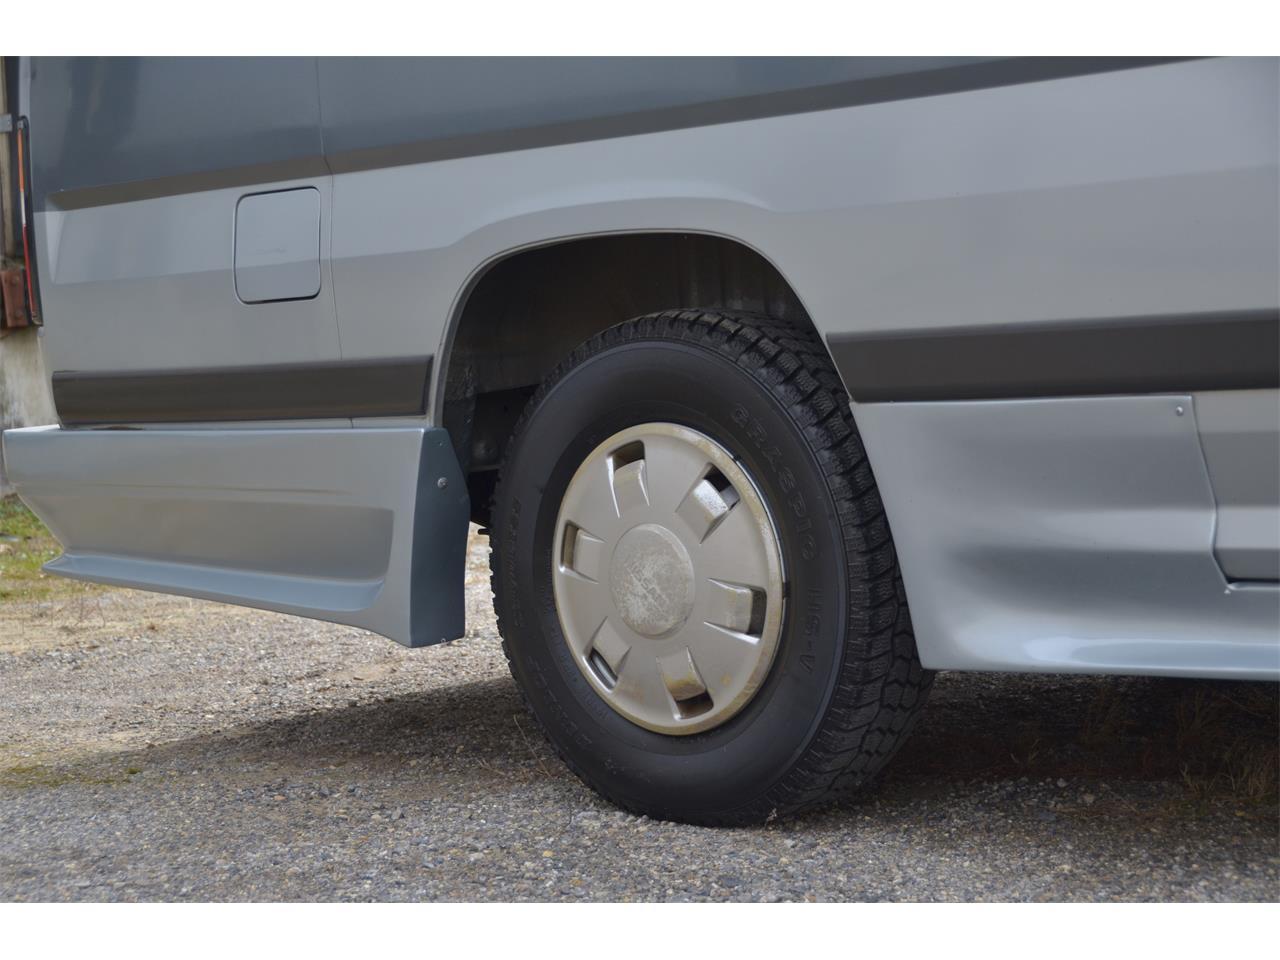 Large Picture of '90 Nissan Caravan located in Virginia - $17,900.00 - LN58